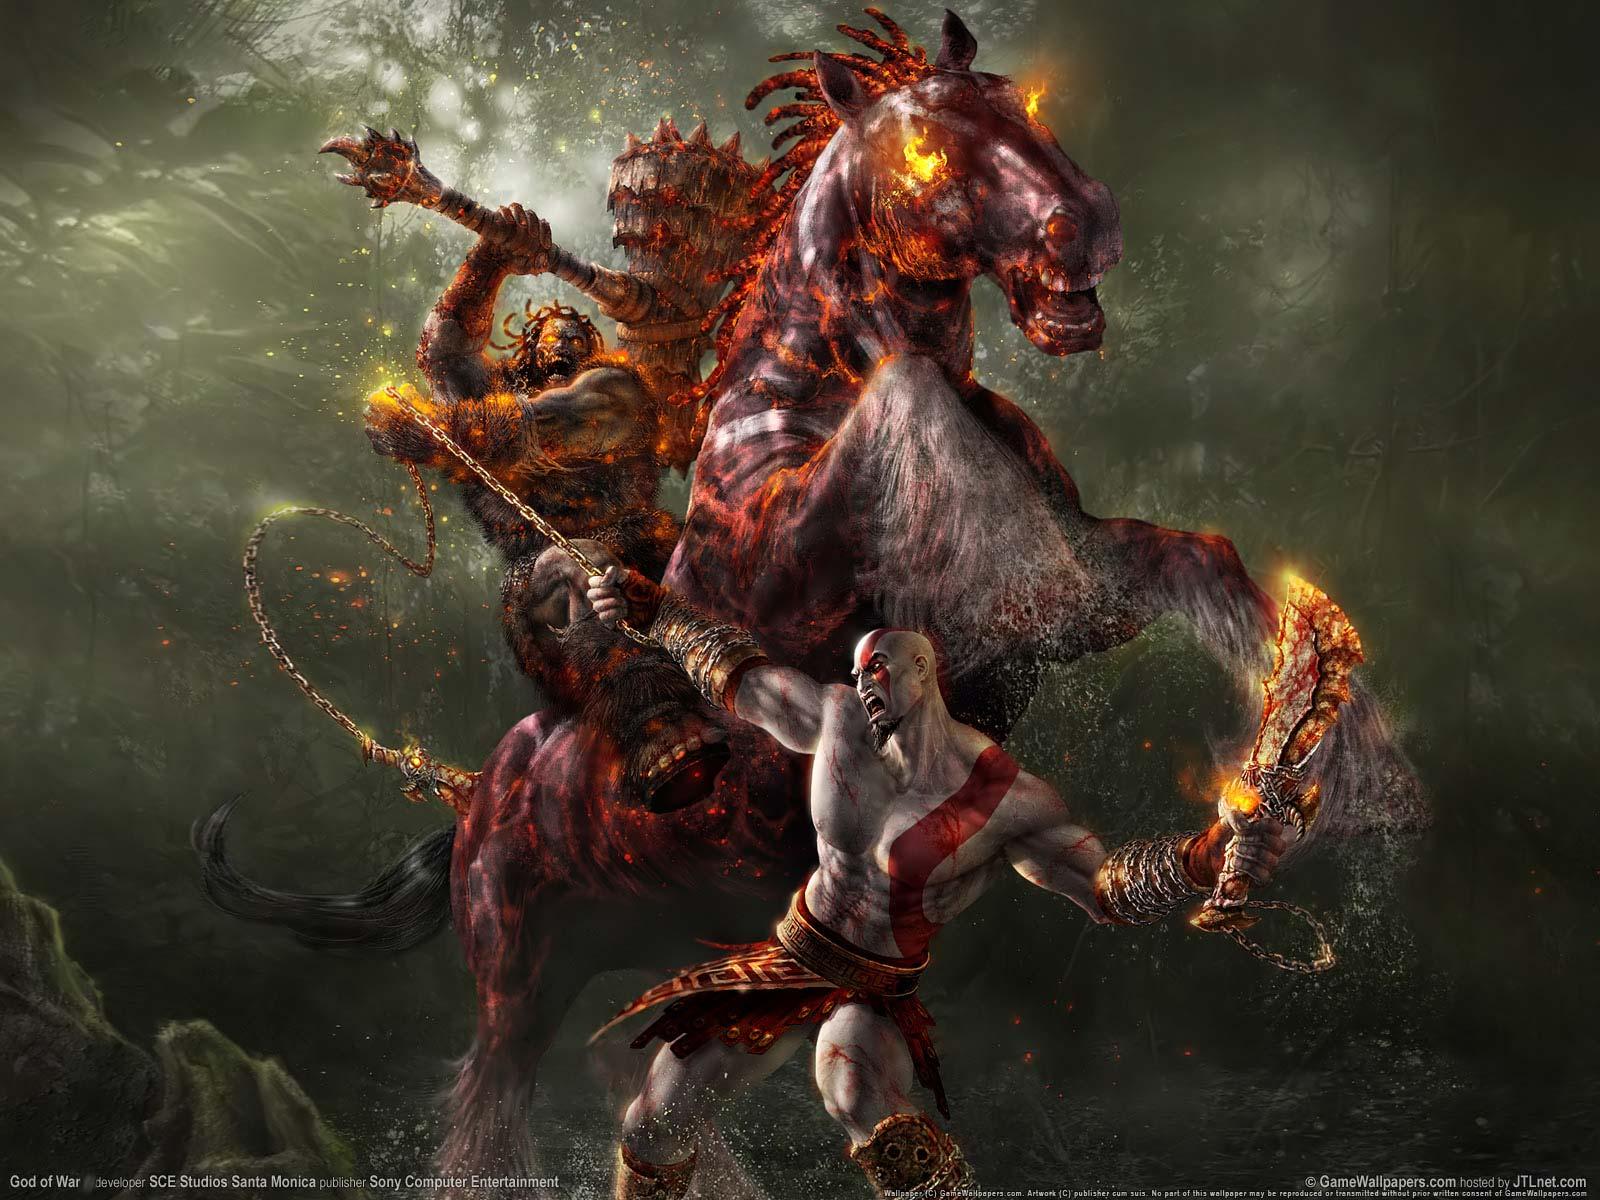 Battle Of The Gods Online